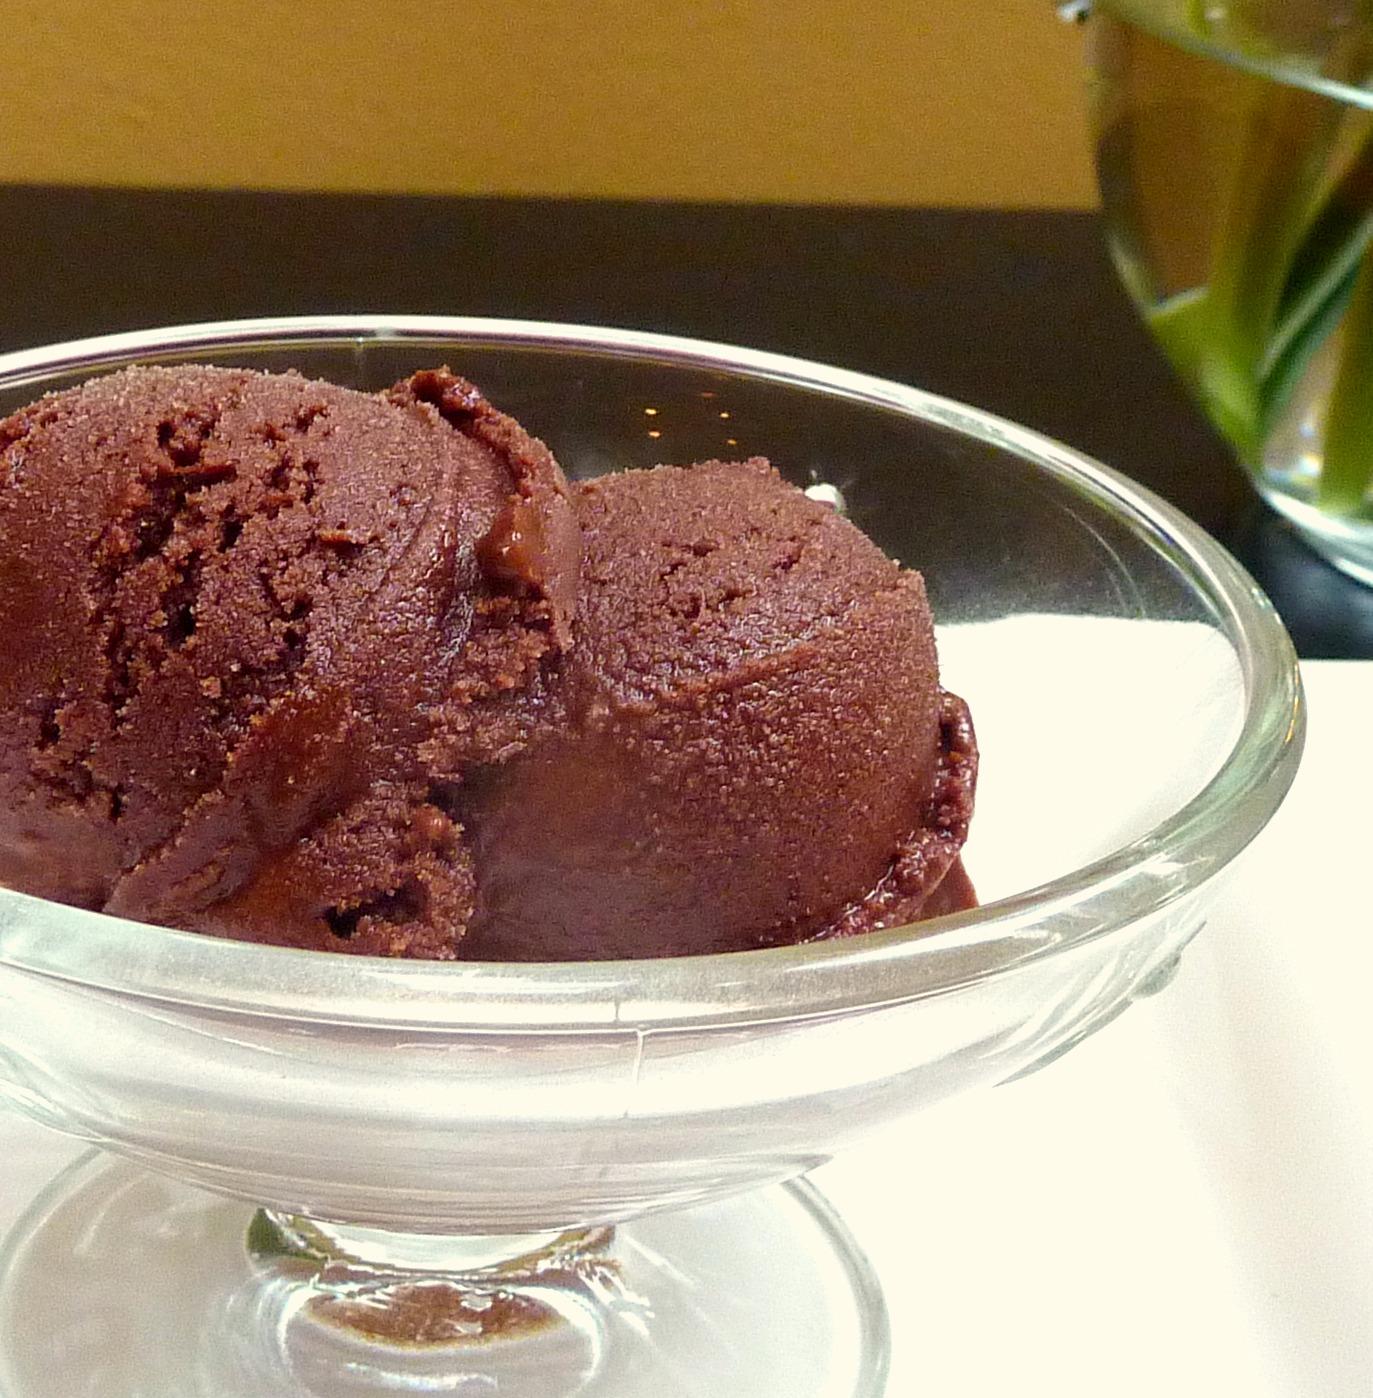 Chocolate Cardamom Sorbet